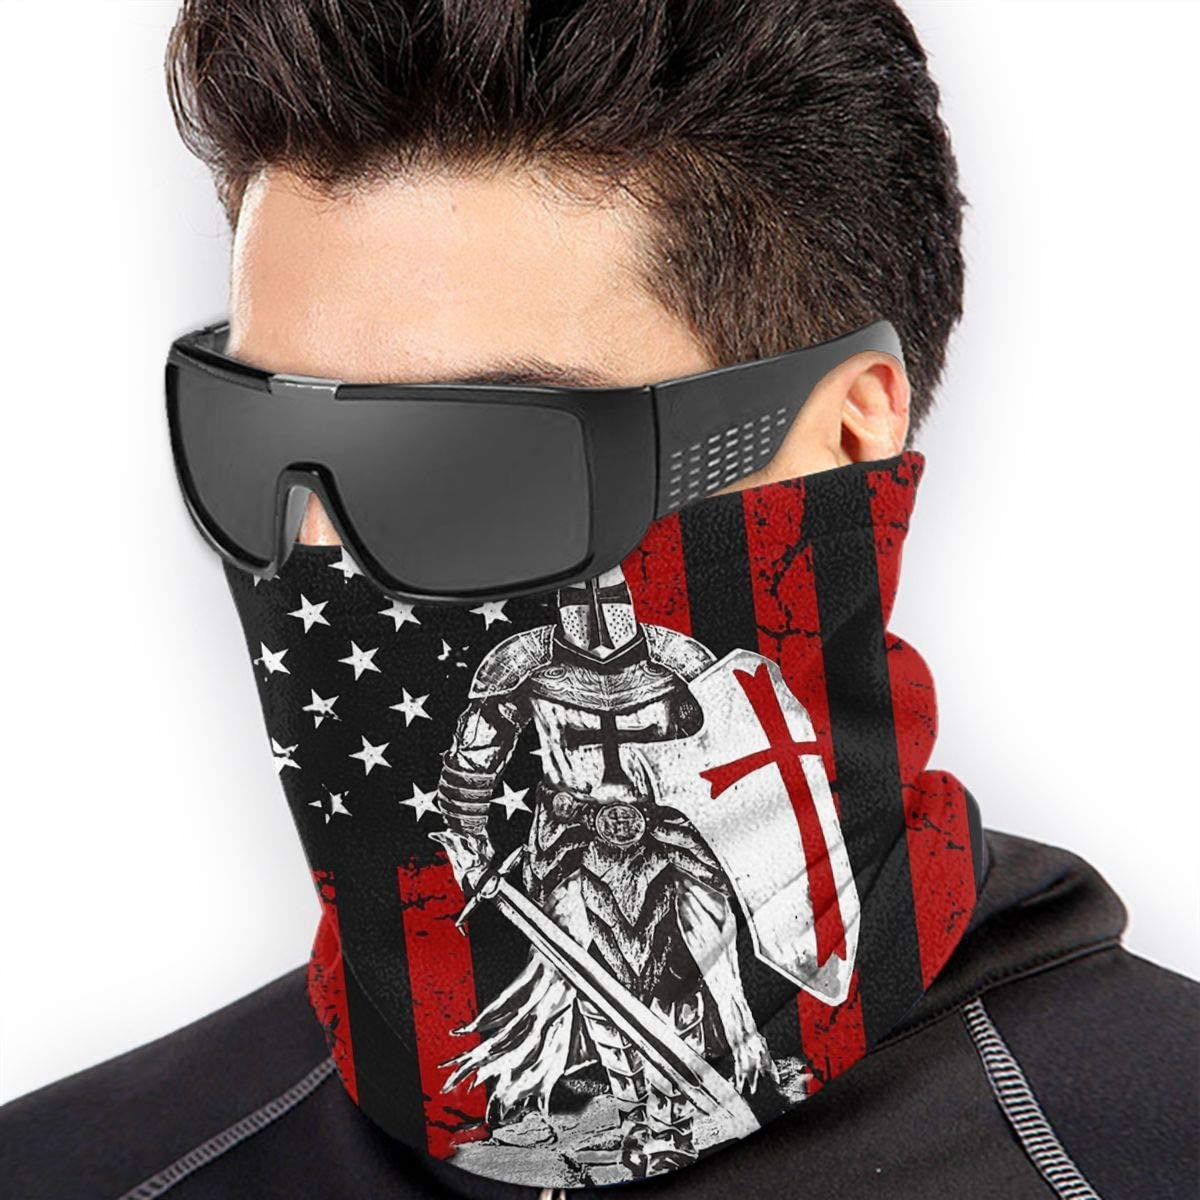 Neck Warmer Windproof Mask Neck Gaiter Knight Templar Crusader Warrior American Flag Warmer Balaclavas Headwear Bandana Multifunctional Head Scarf Free UV Face Mask For Women Man 2020